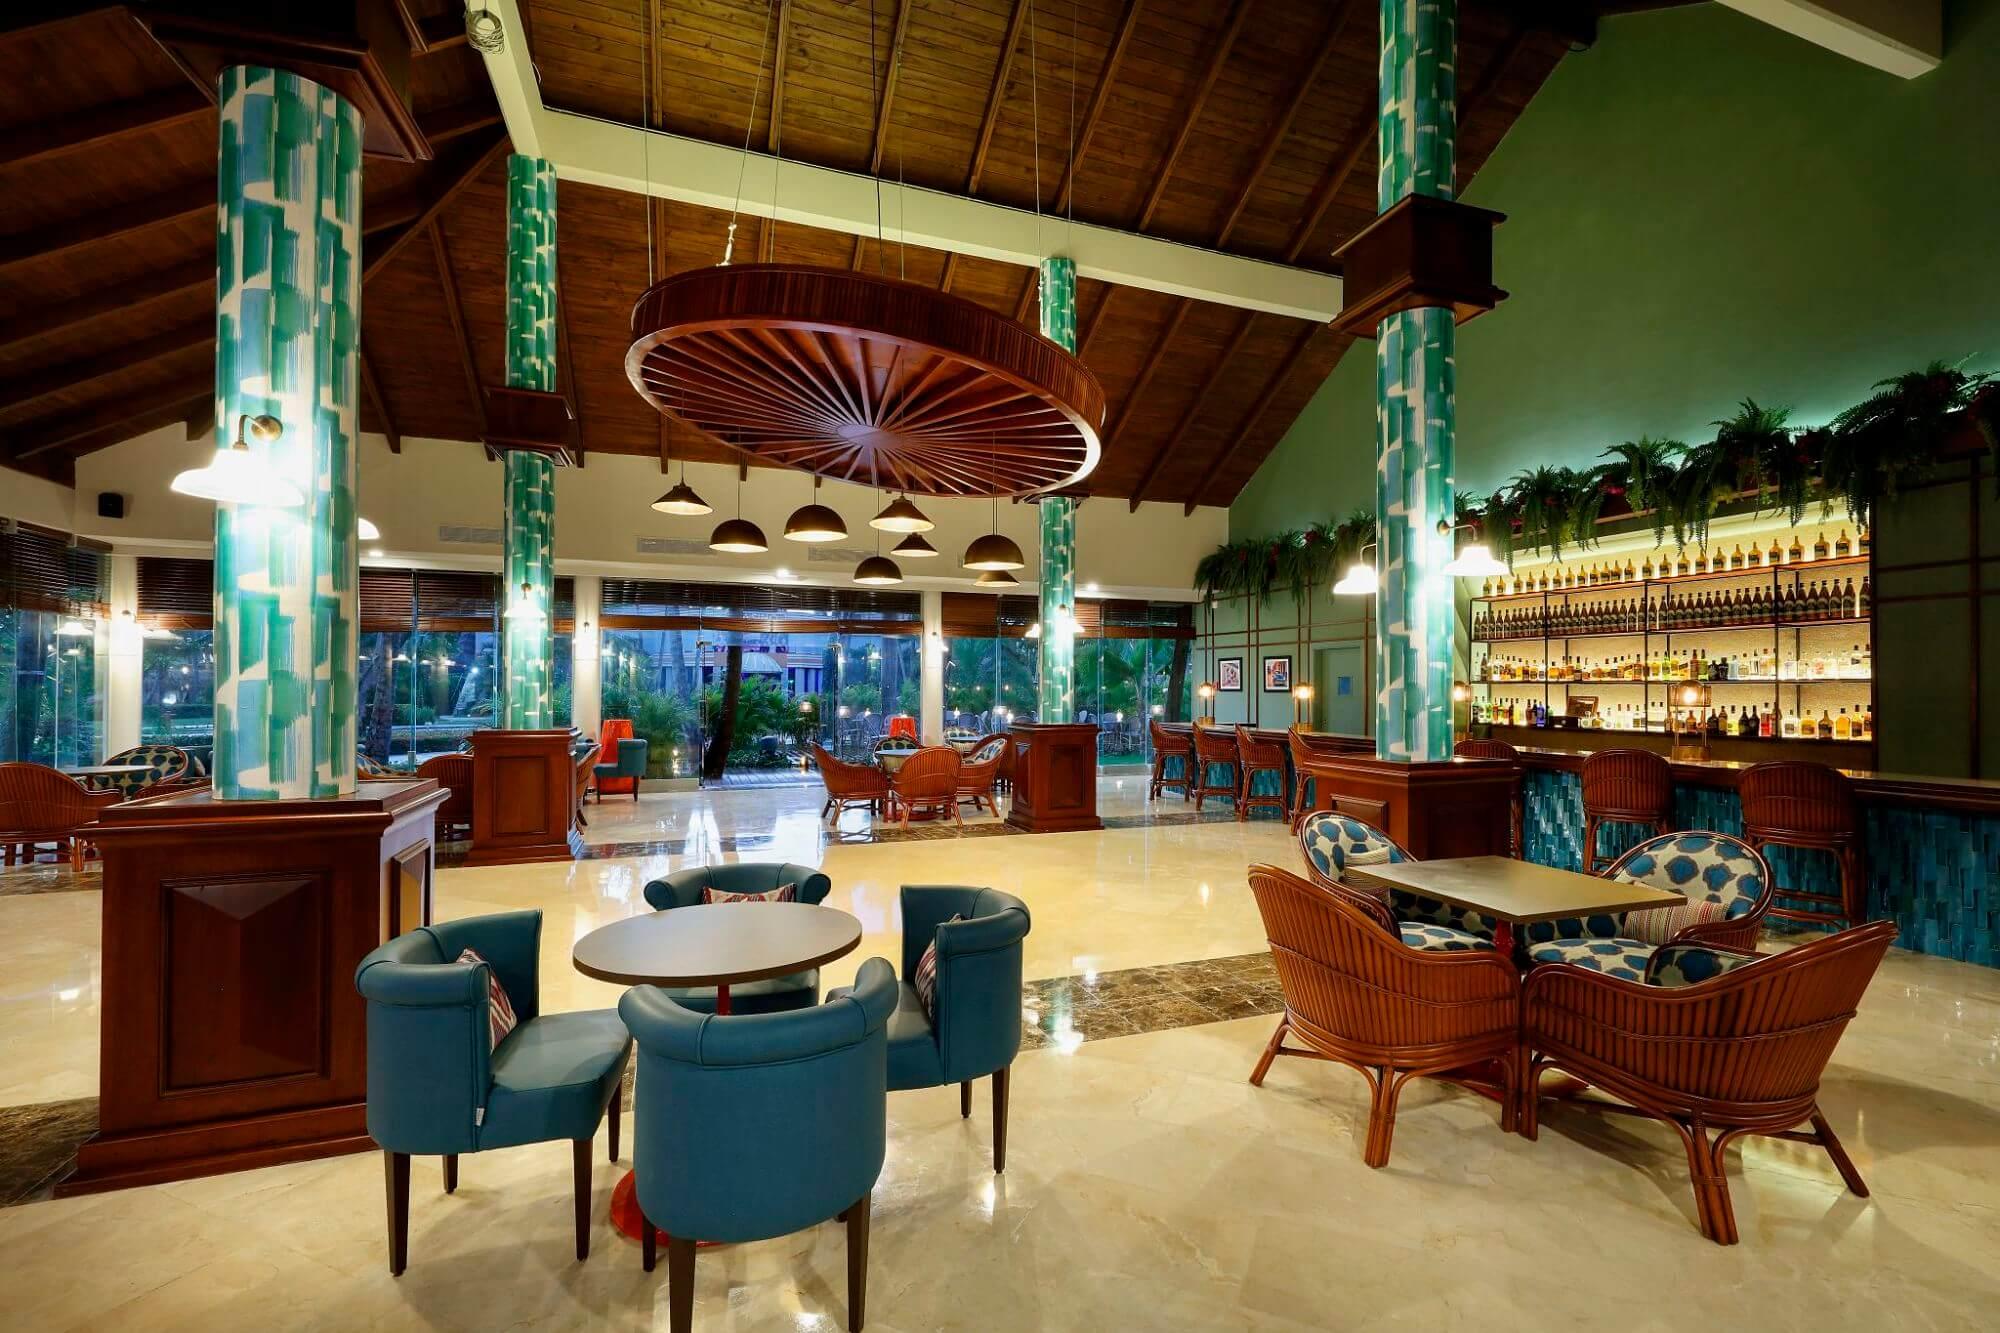 Hemingway Bar at the Grand Palladium Resort